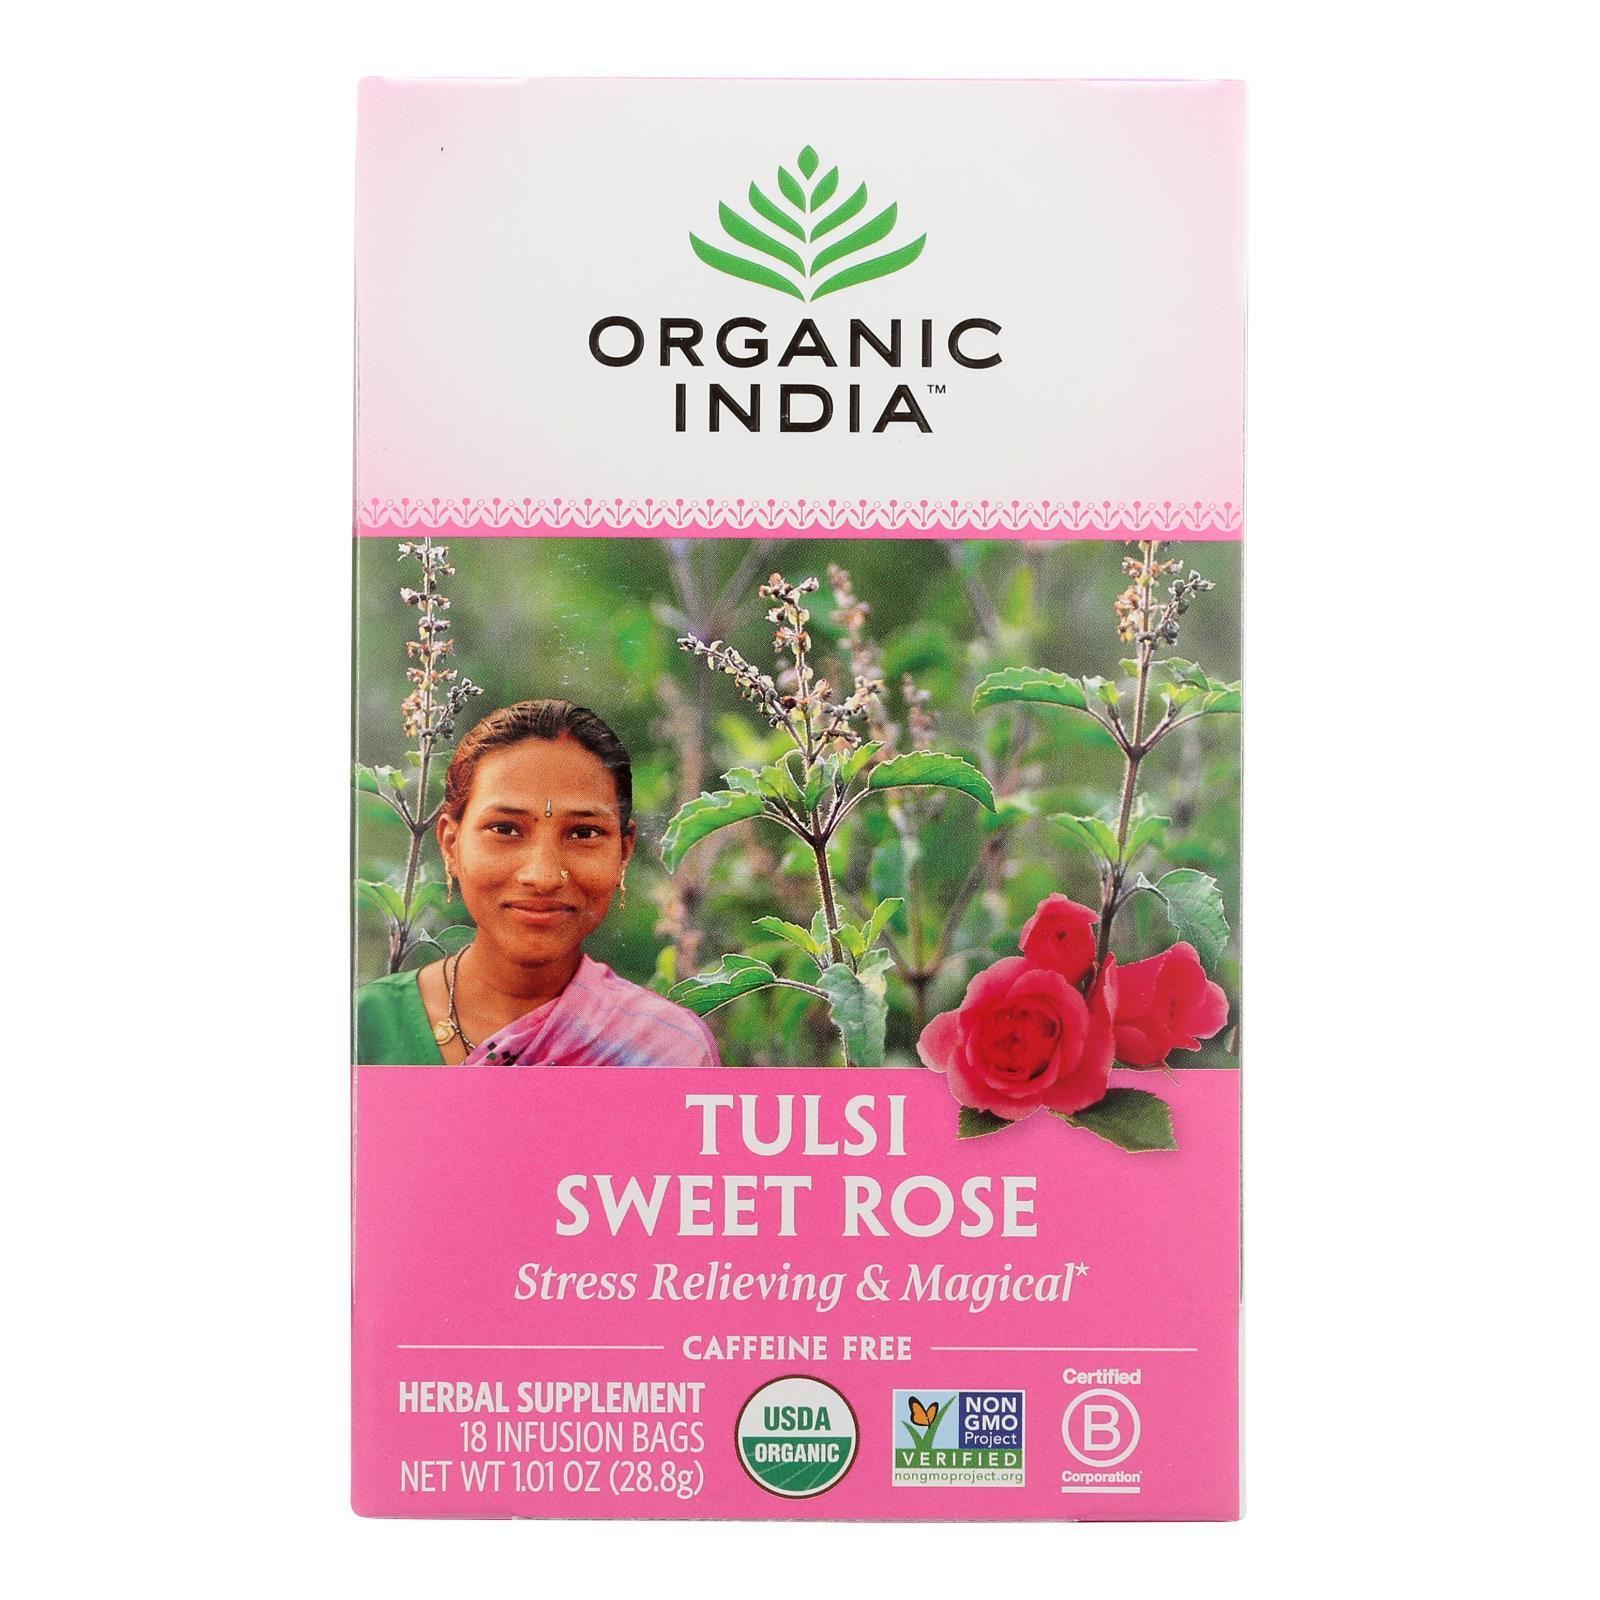 Organic India Tulsi Tea Sweet Rose - 18 Tea Bags - Case of 6